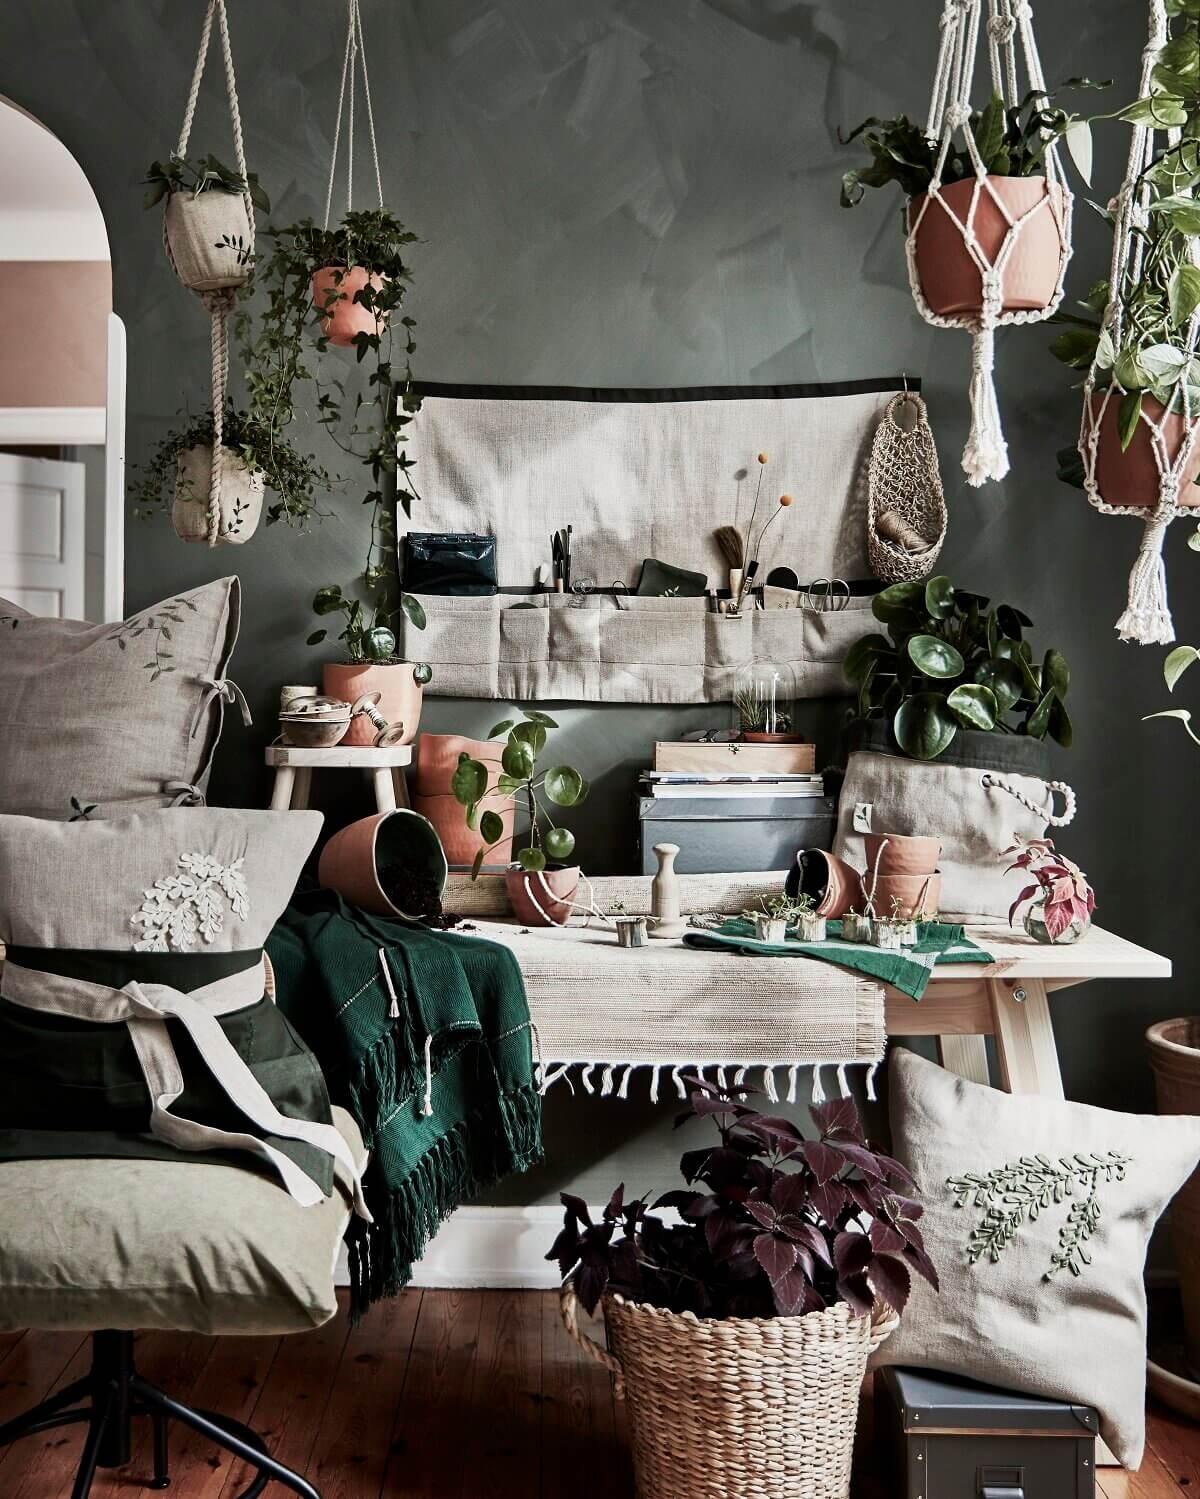 Botanisk: A Handmade Indoor Gardening Collection by IKEA